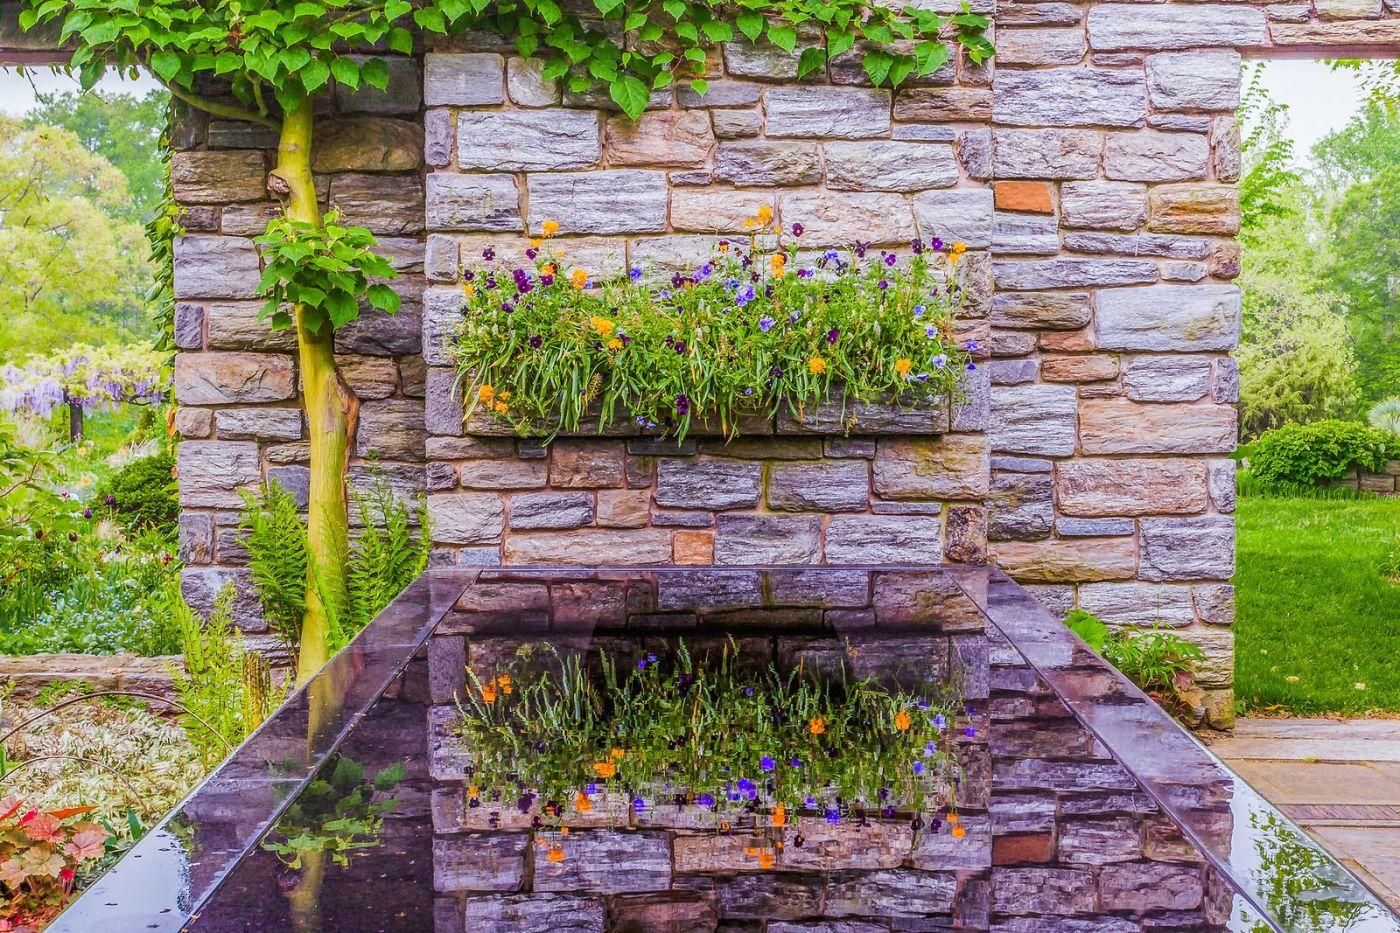 Chanticleer花园,一步一景_图1-18